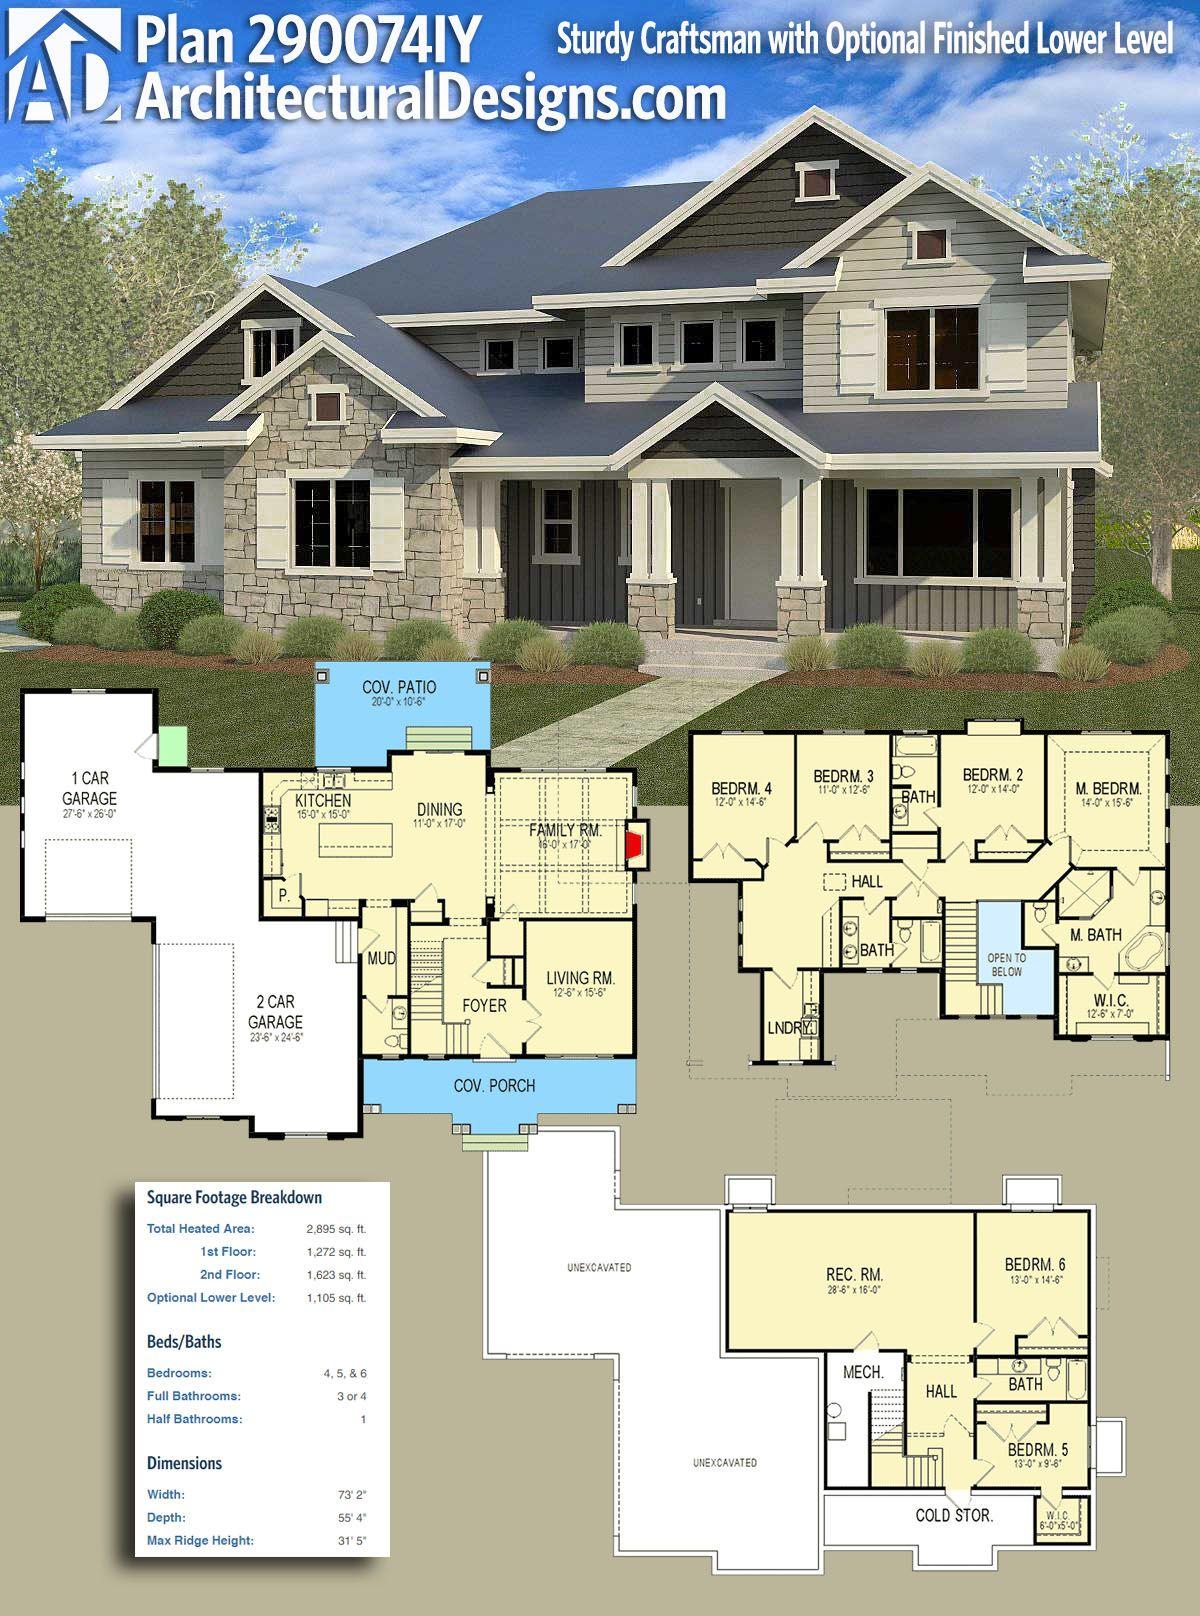 Plan 290074iy Sturdy Craftsman With Optional Finished Lower Level Craftsman House Plans Craftsman House Craftsman House Plan